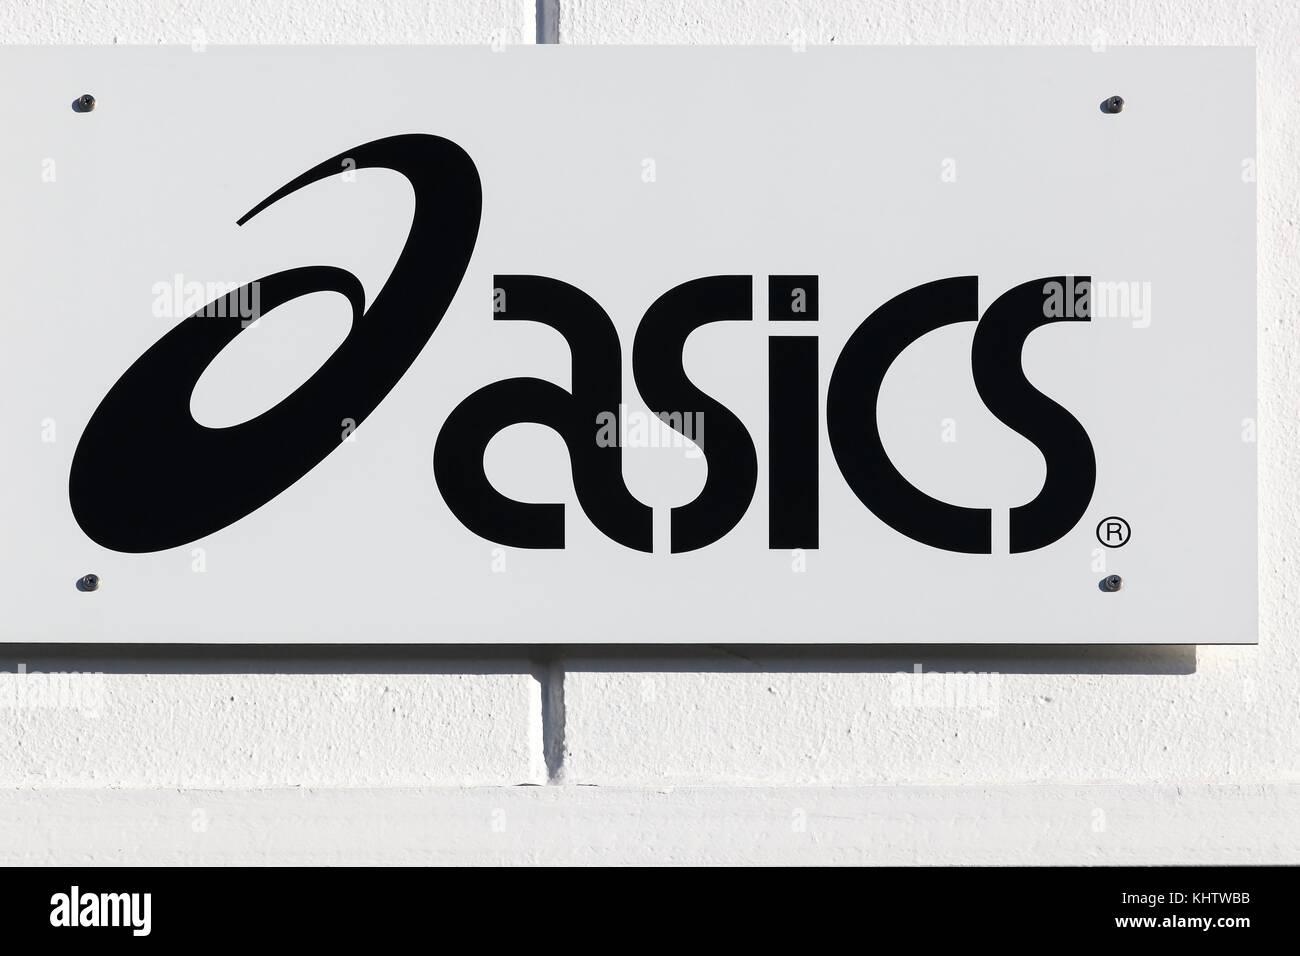 Asics Logo Photos & Asics Logo Images Alamy